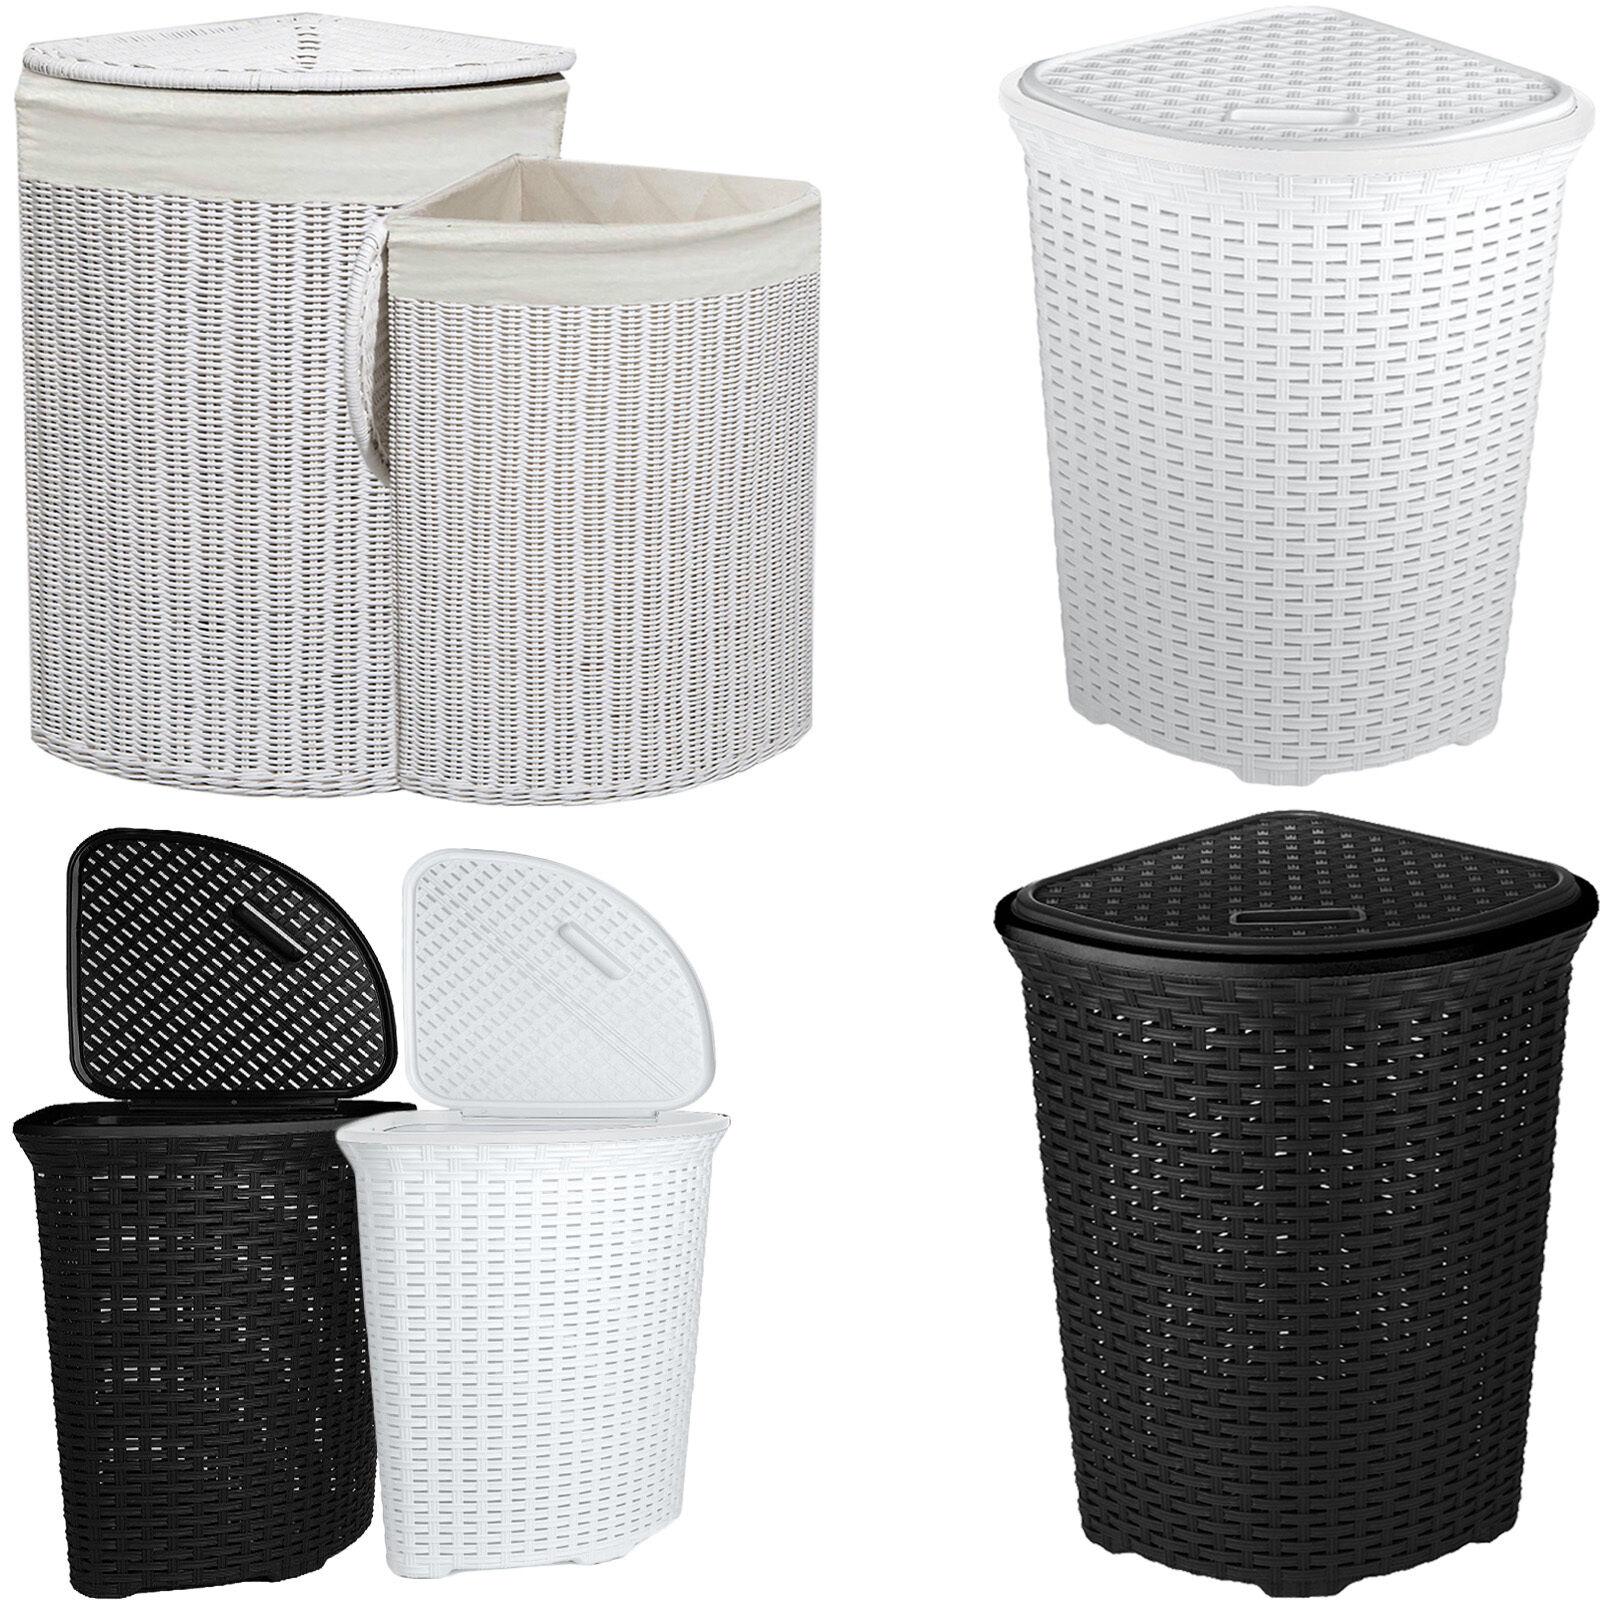 Corner Rattan Wicker Laundry Basket